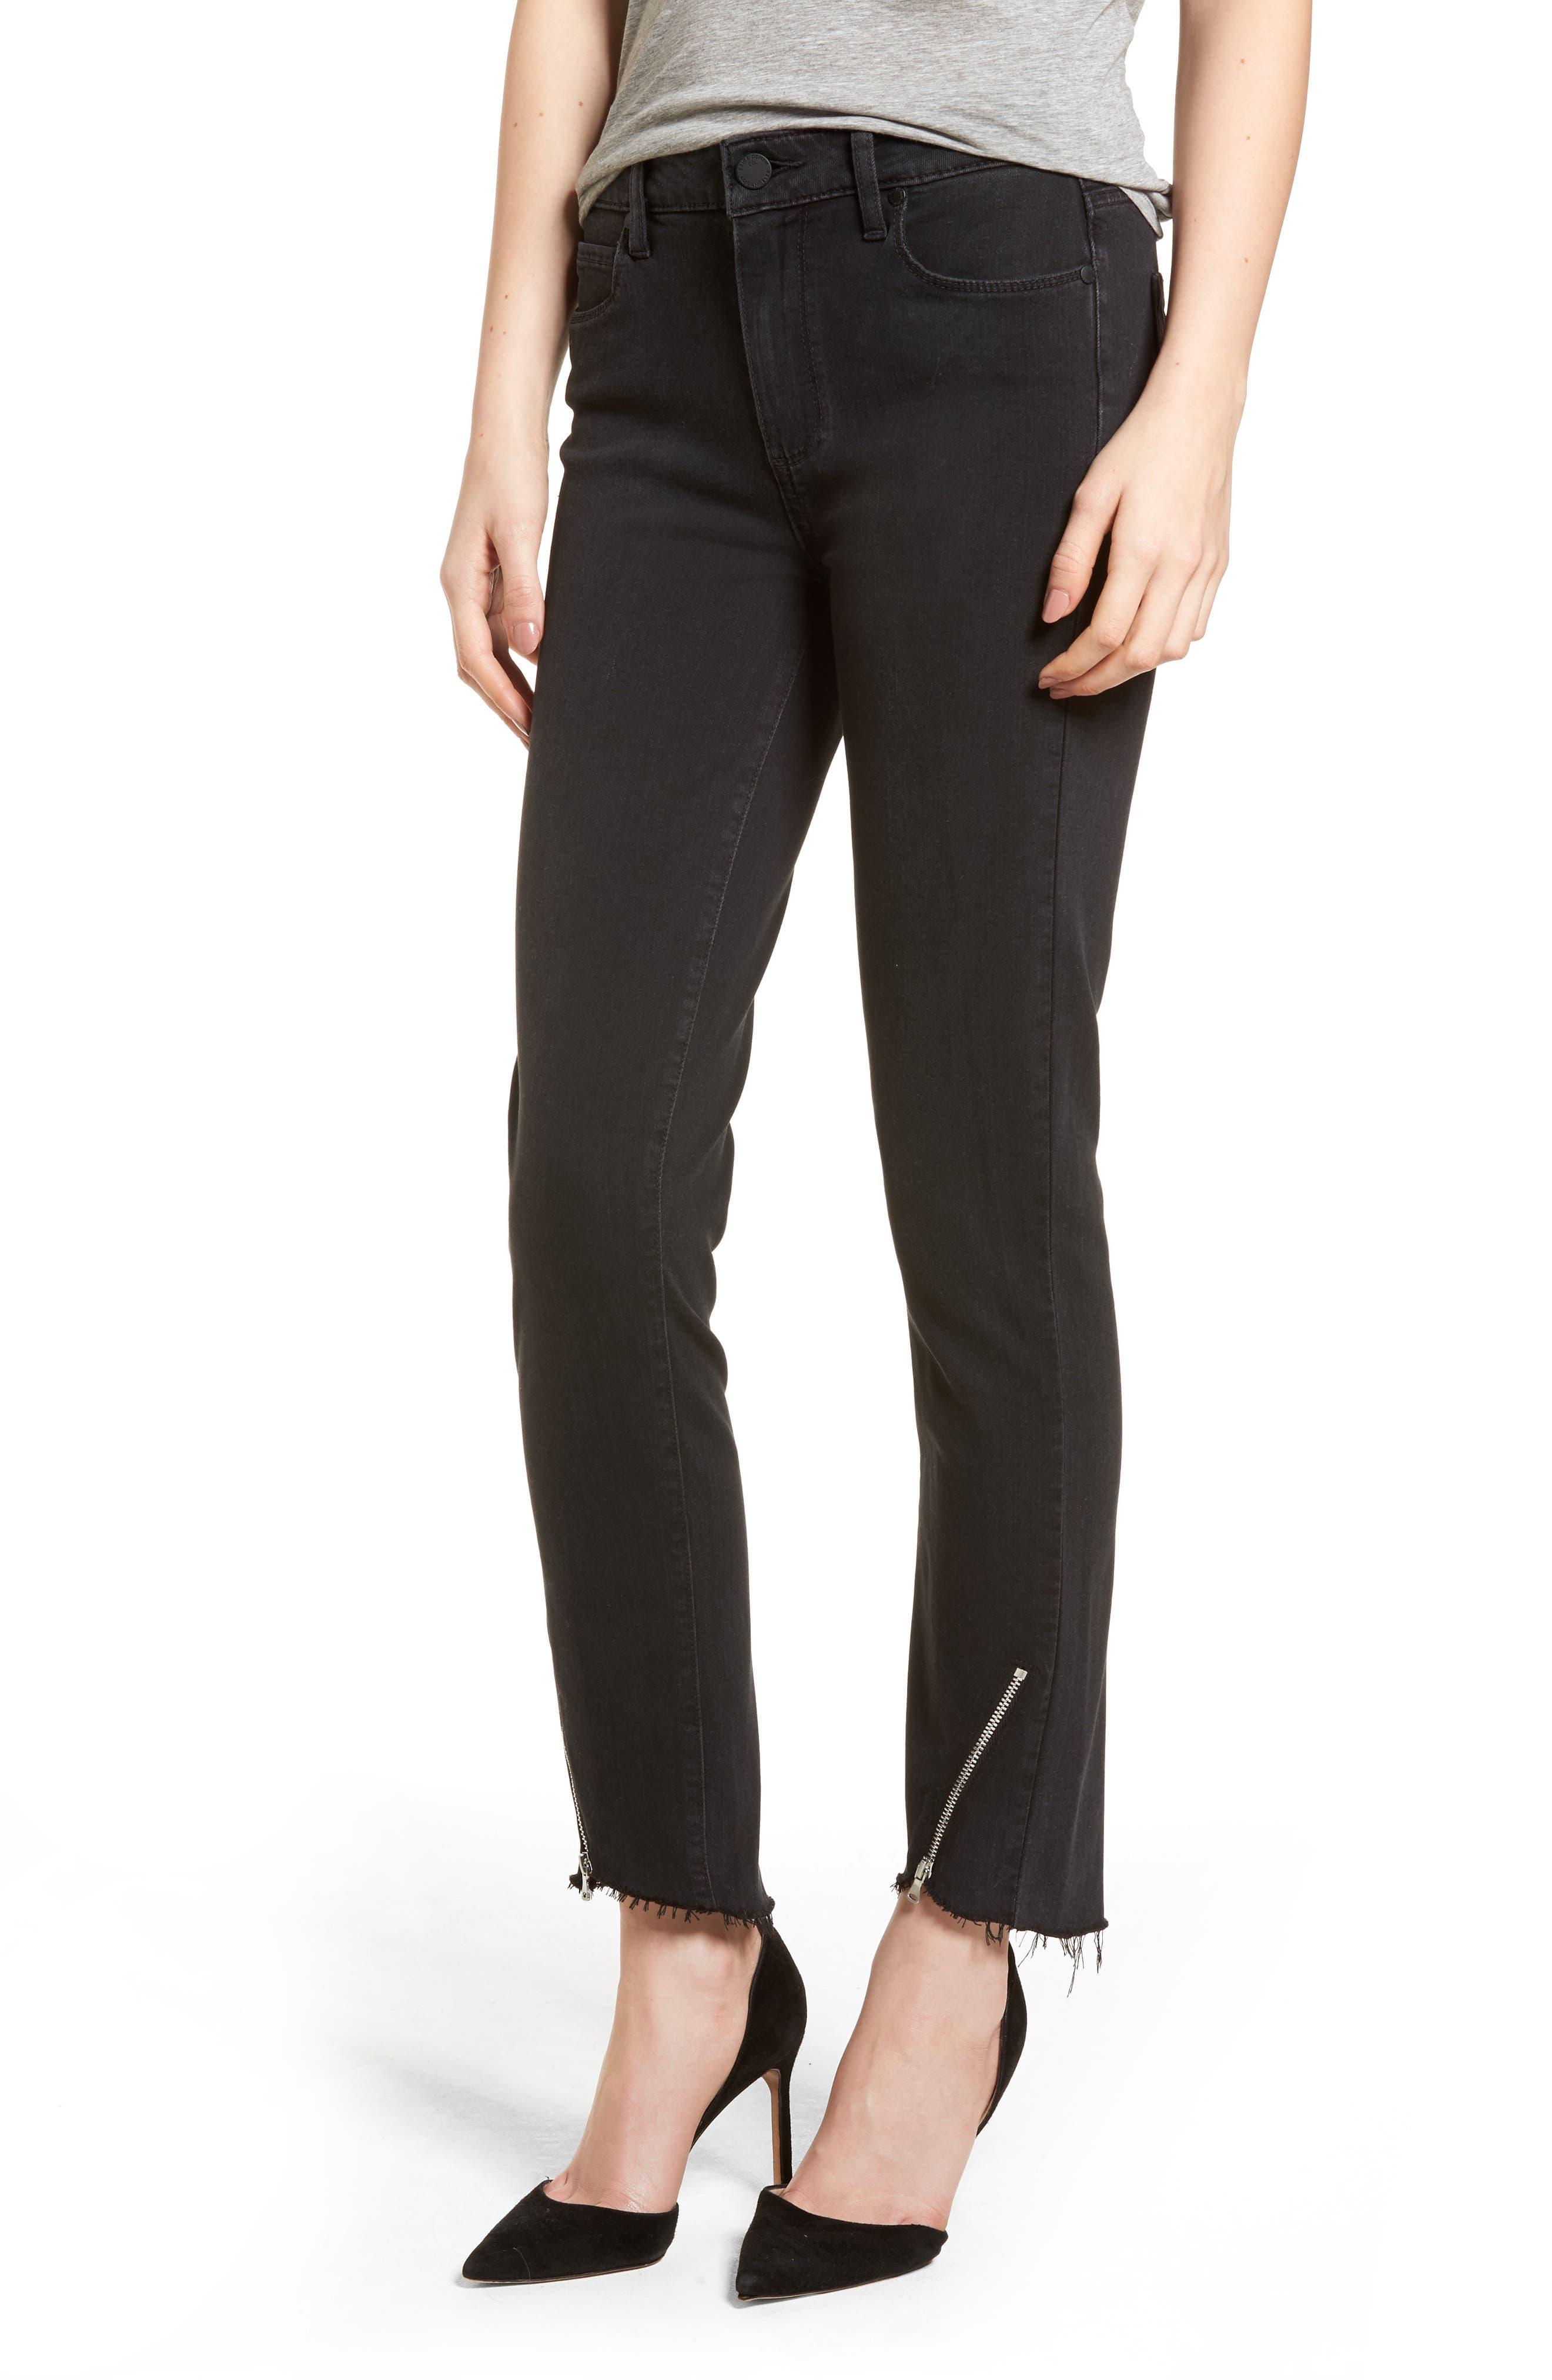 Transcend - Hoxton High Waist Ultra Skinny Jeans,                         Main,                         color, Black Fog